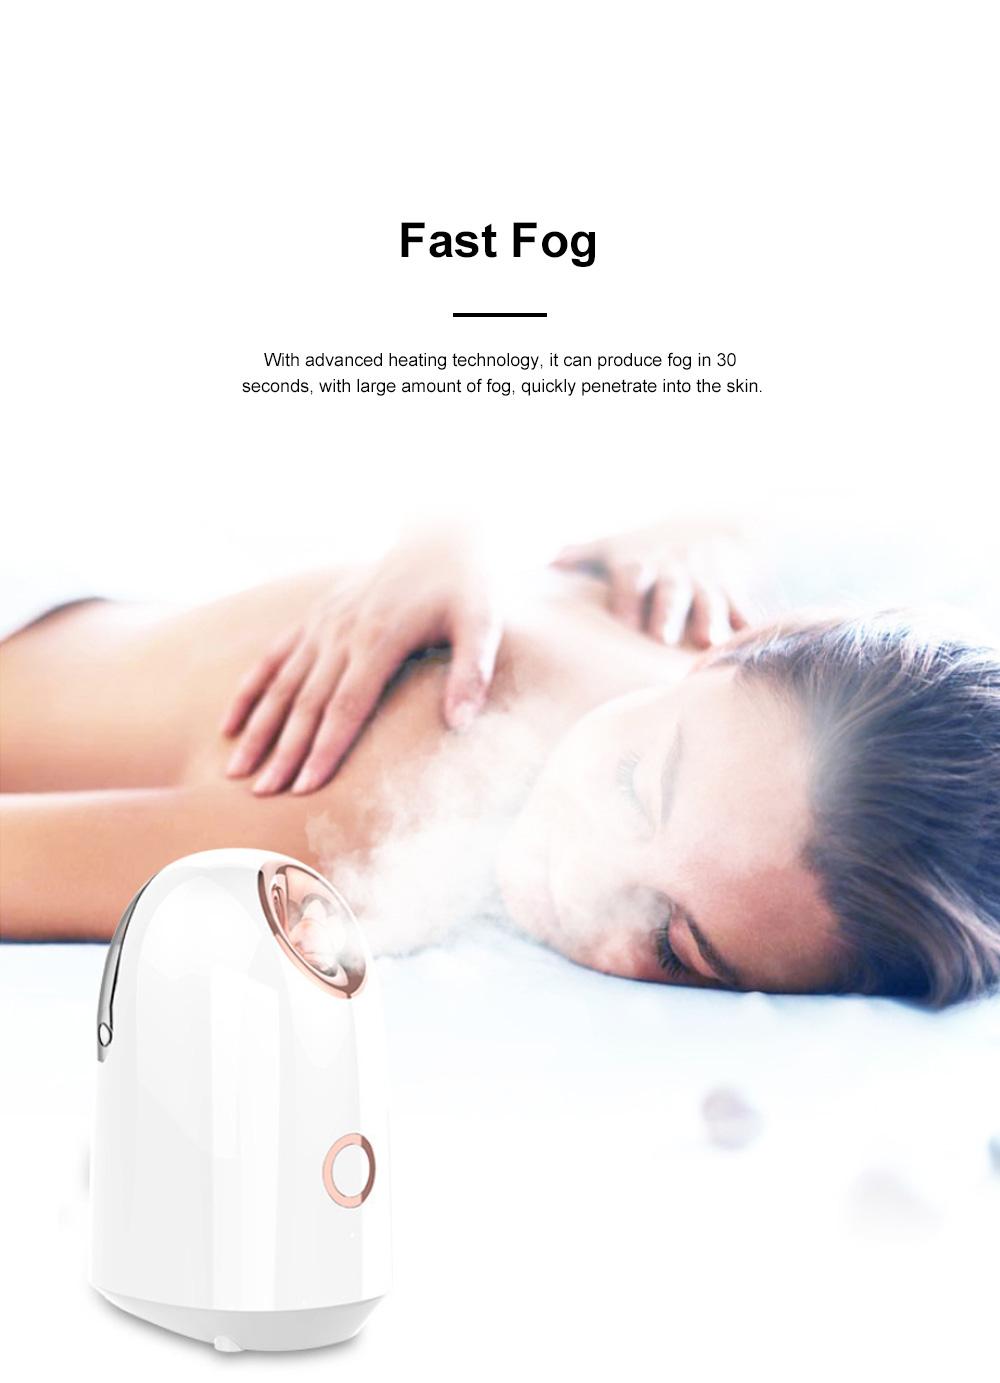 Nanometer Ion Moisturizer Household Steamer Moisturizer Thermal Spray Steamer Cosmetology Instrument Facial Moisturizer 2